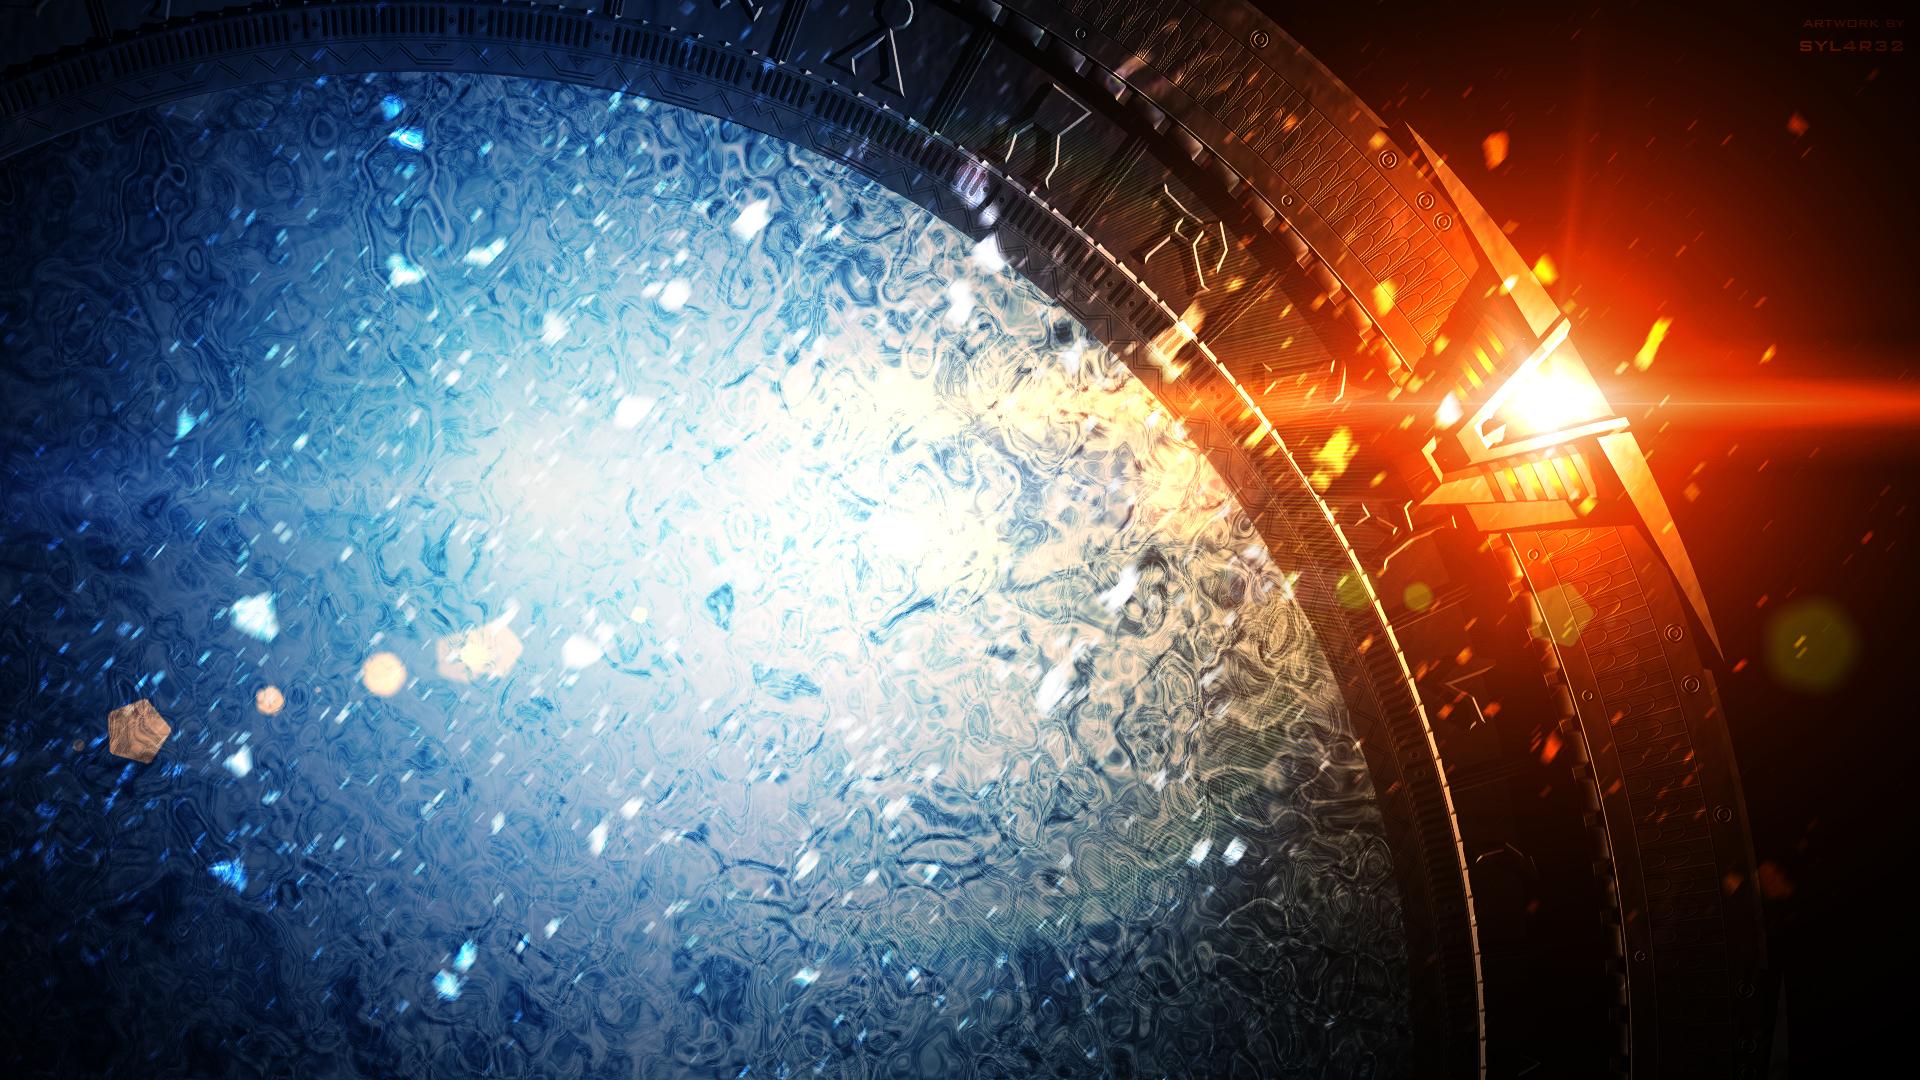 Night Wallpaper No Logo By Ualgreymon On Deviantart: Stargate SG-1 Title Wallpaper (No Logo Version) By SYL4R32